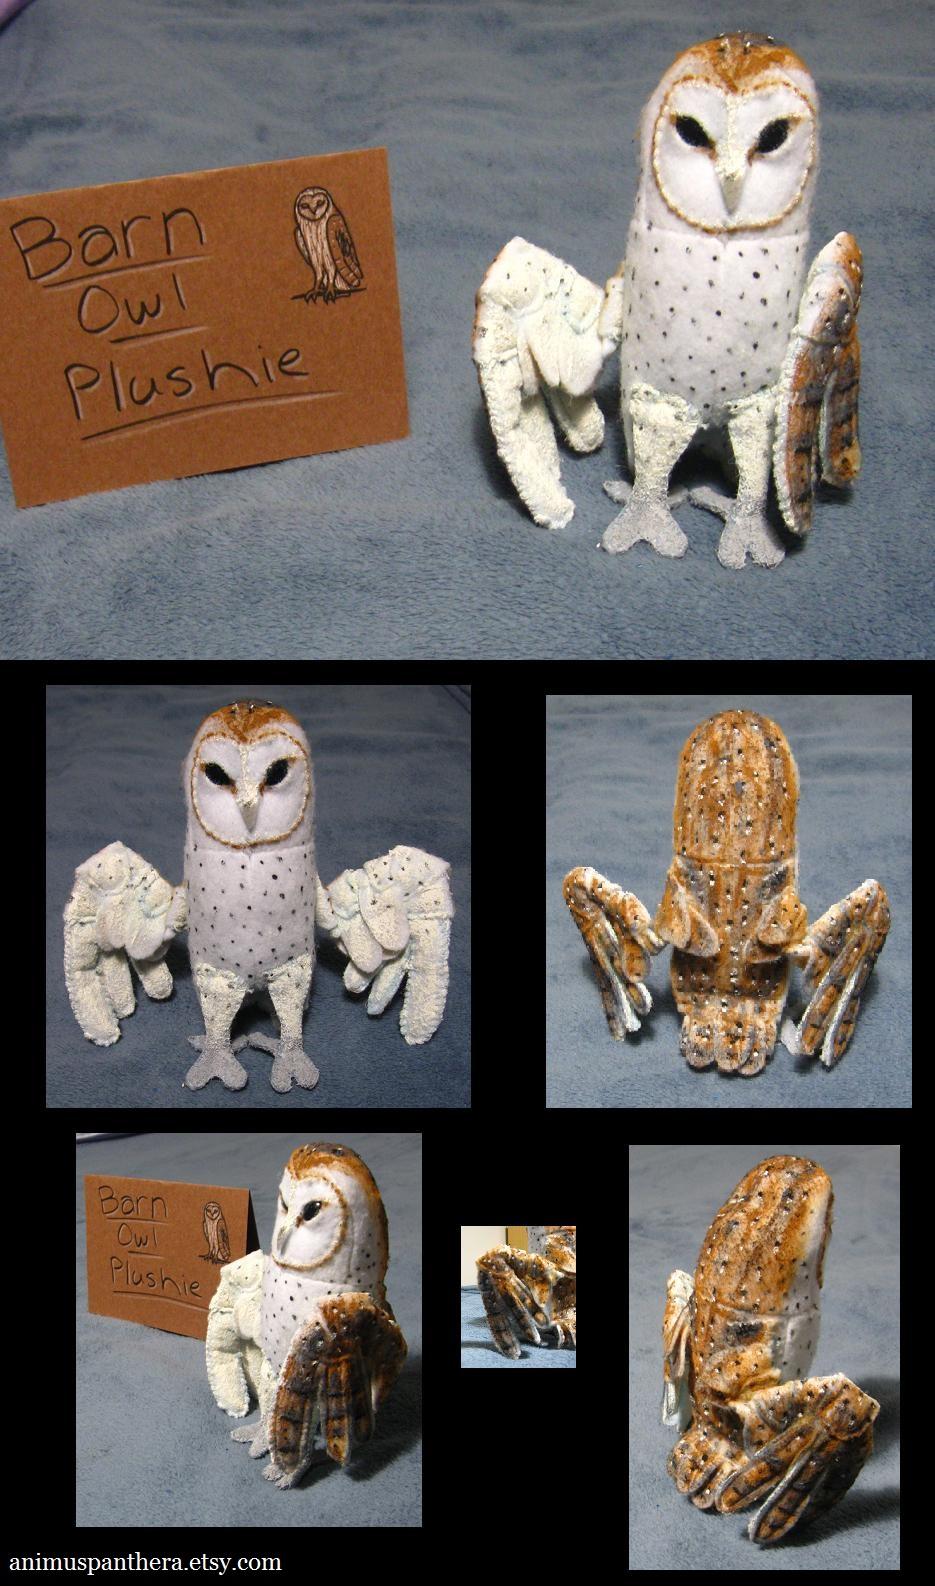 Common Barn Owl plush by Animus-Panthera